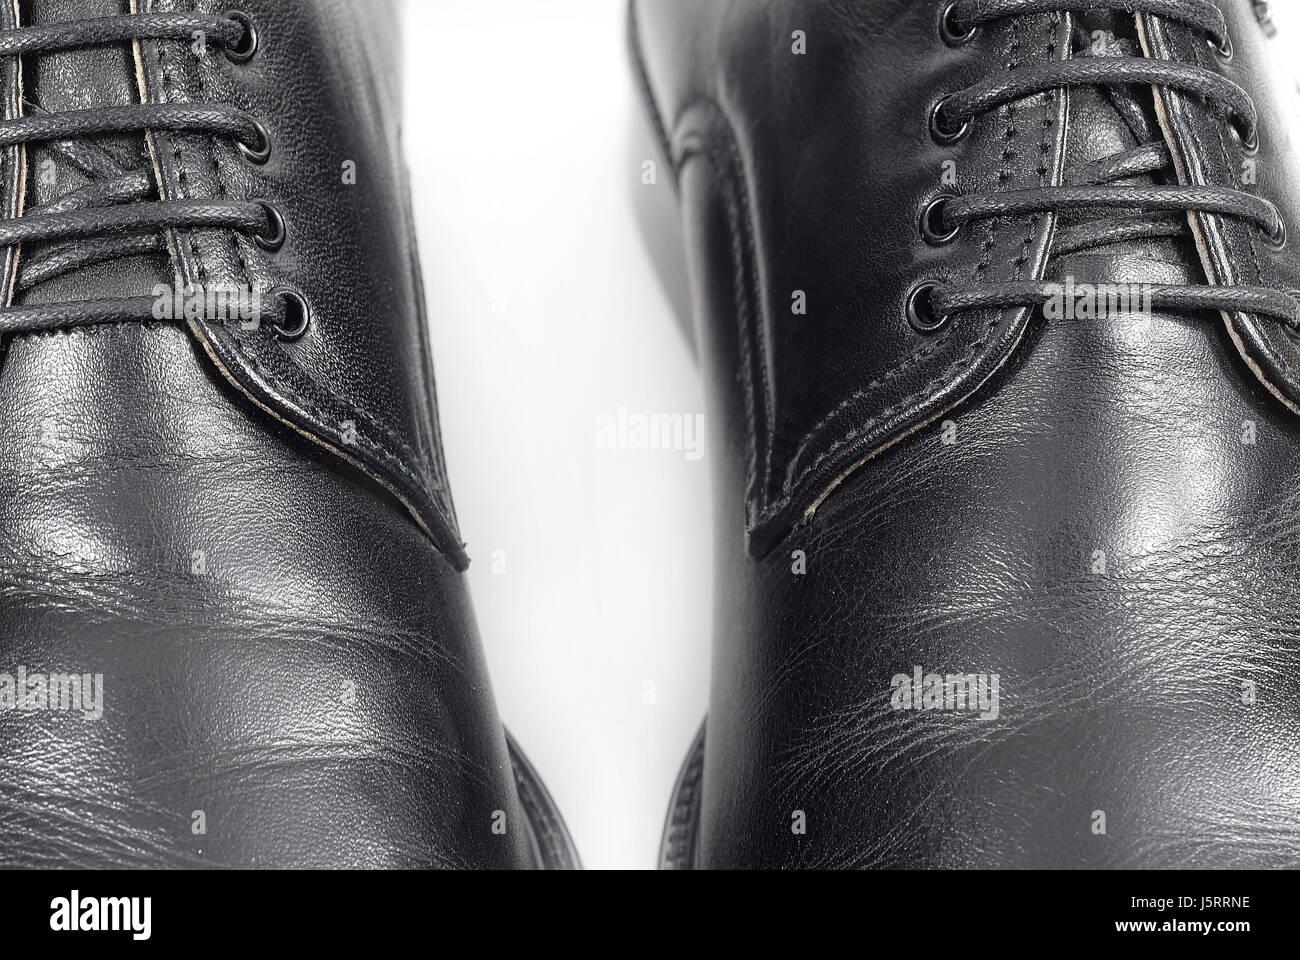 fashion black swarthy jetblack deep black shoes leather classical bright shiny Stock Photo